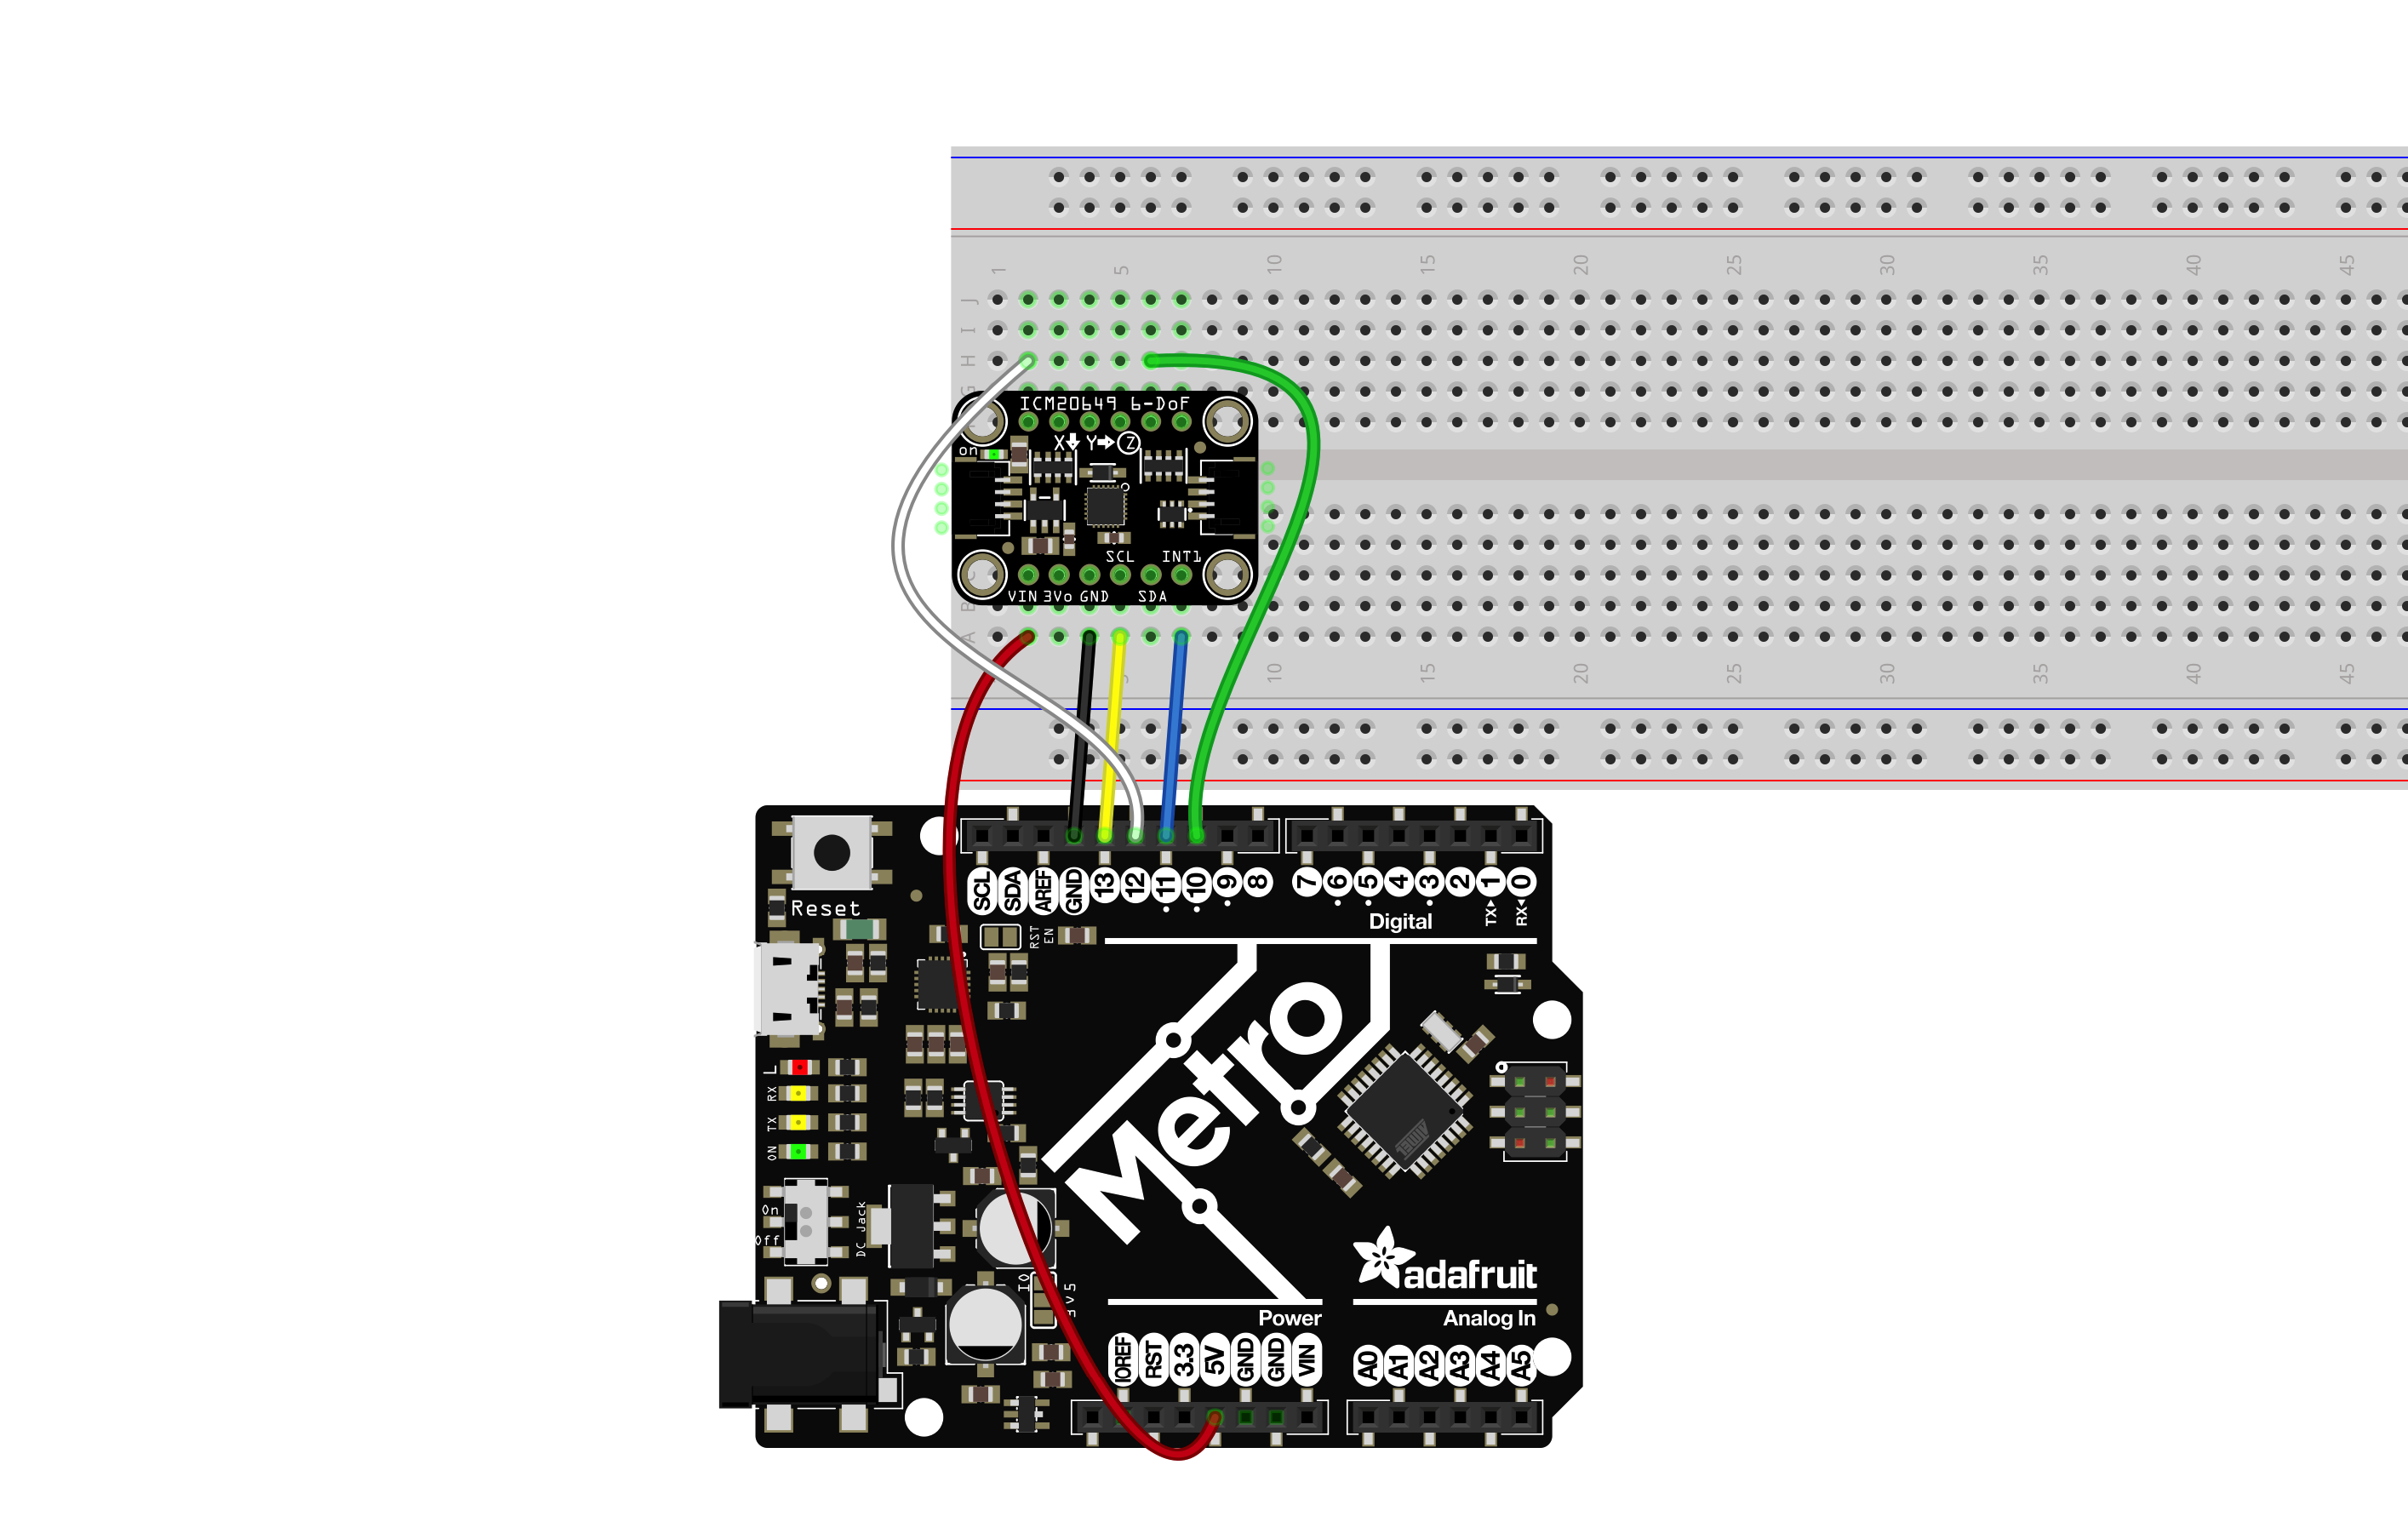 sensors_c_arduino_wiring_z_spi.png